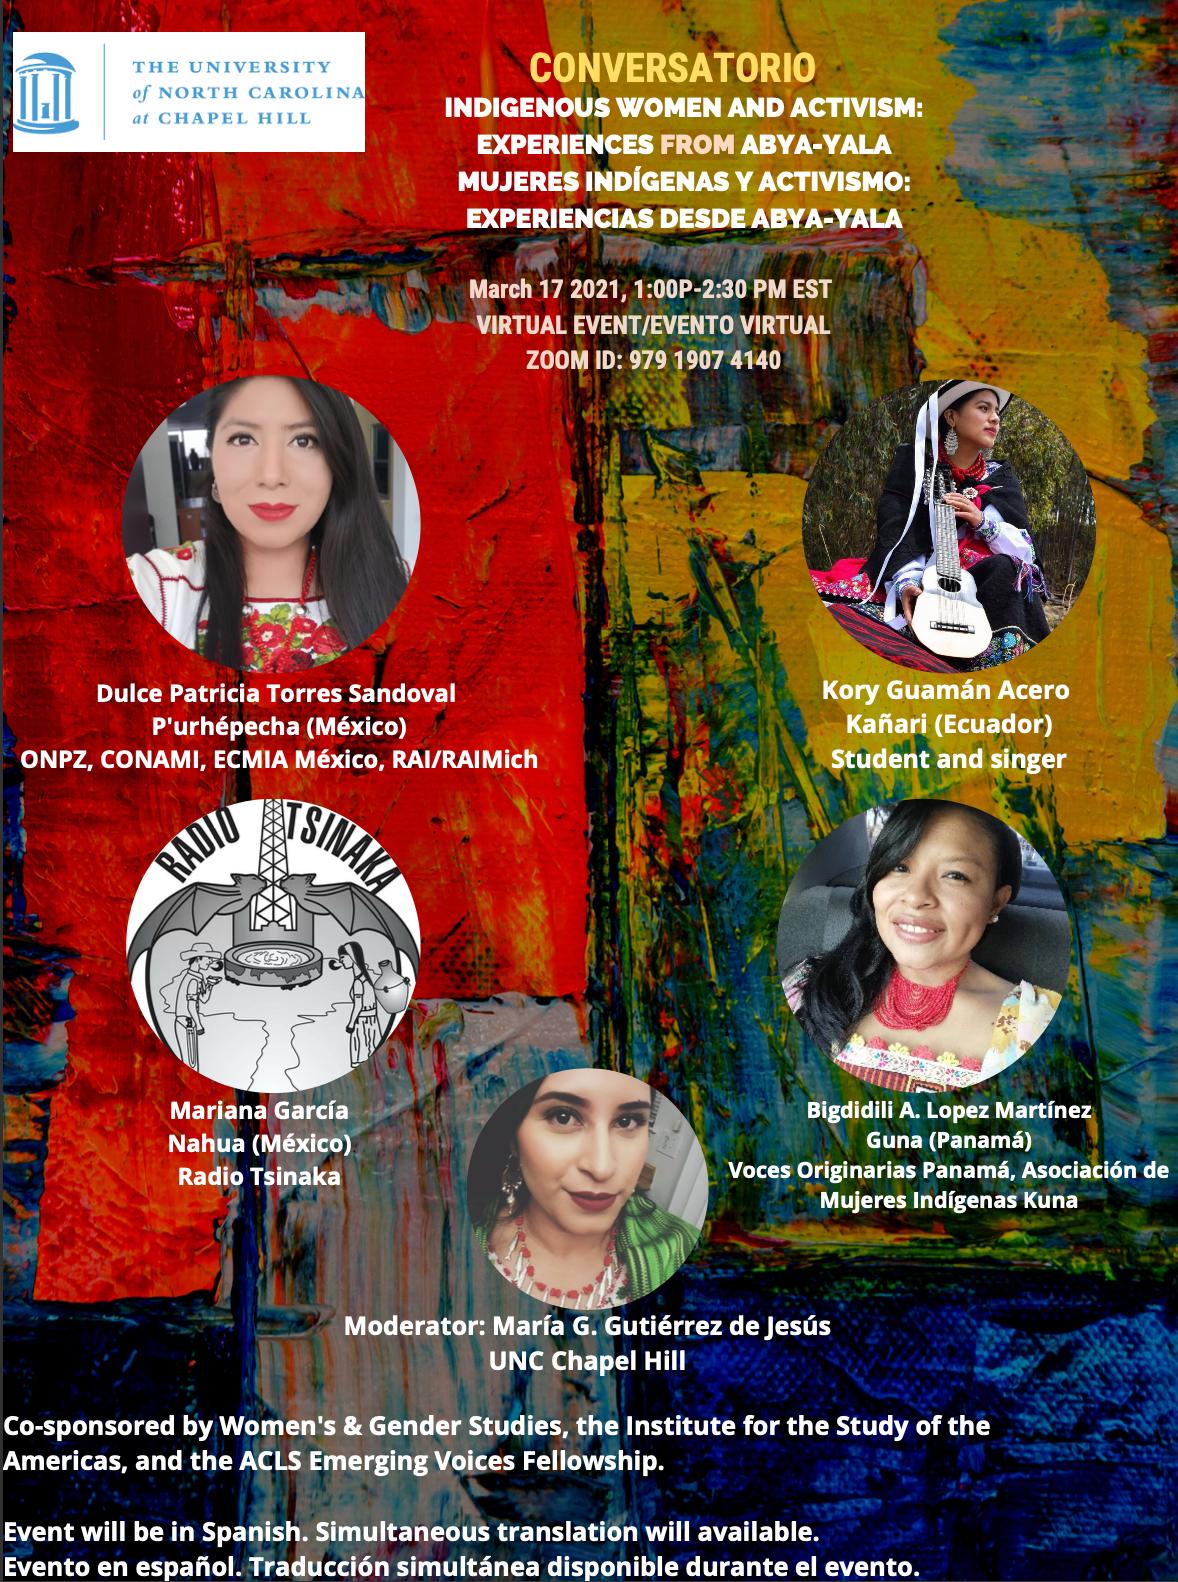 Conversatorio - Indigenous Women and Activism: Experiences from Abya-Yala